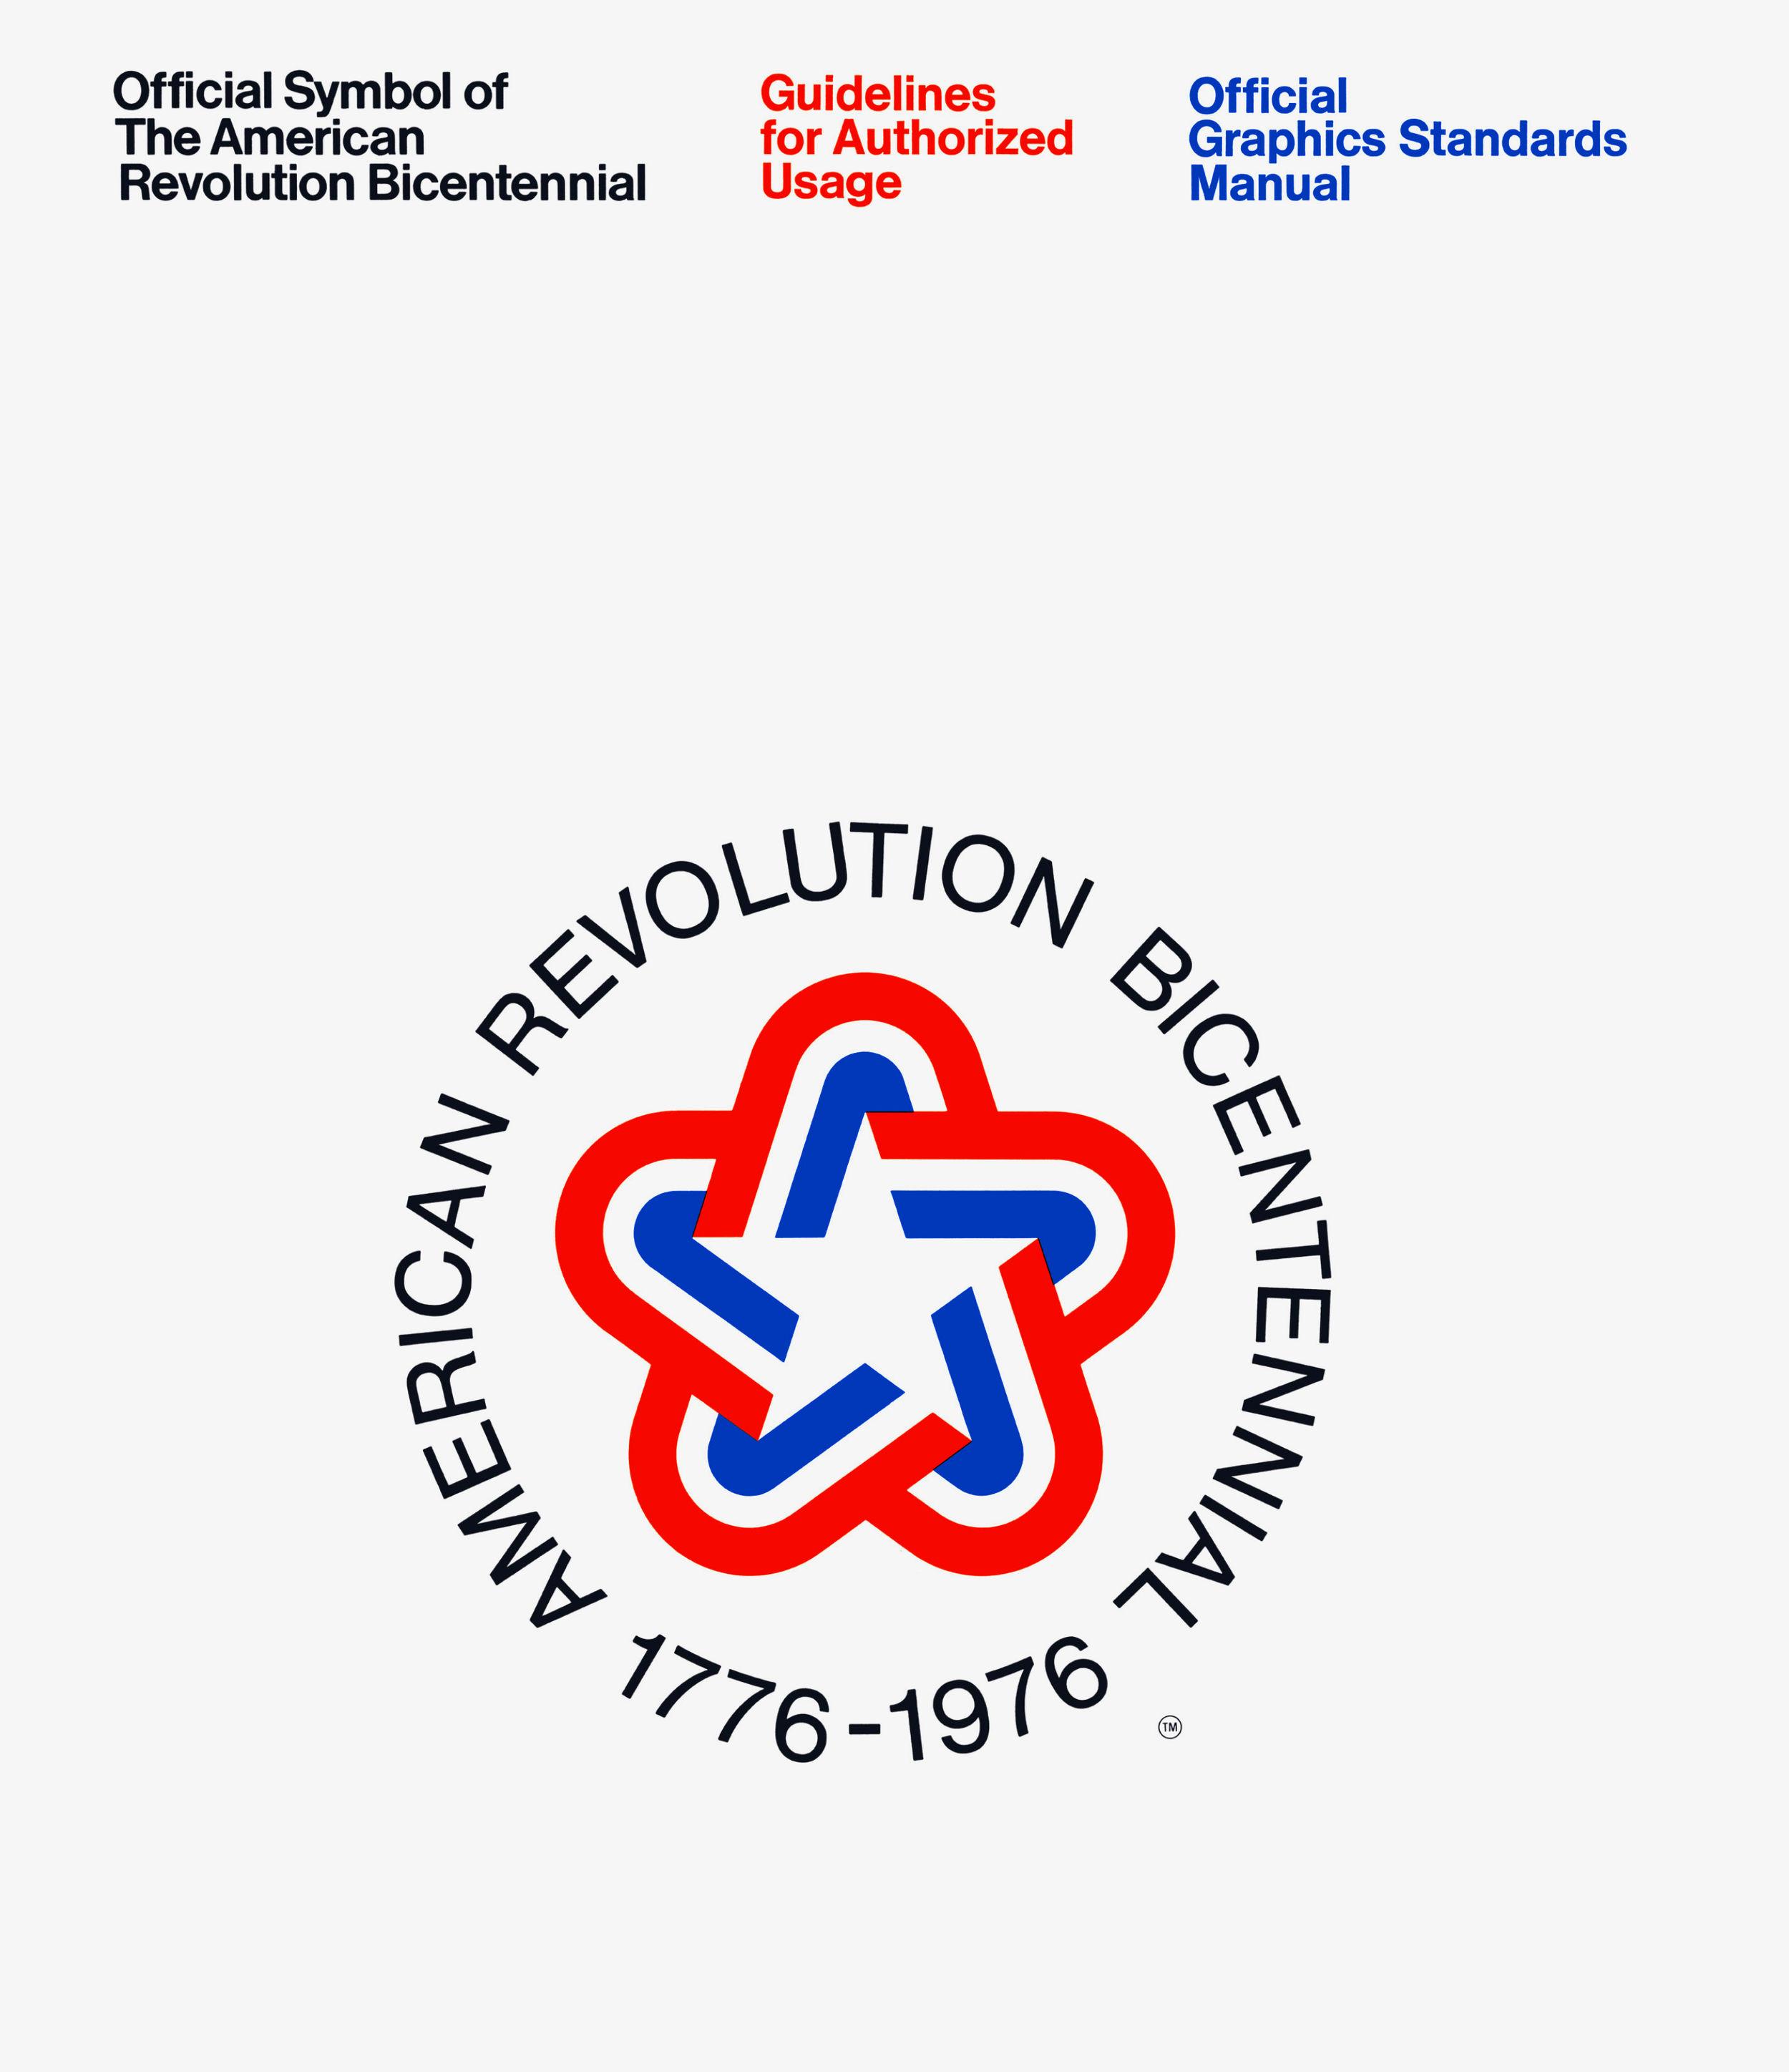 American Revolution Bicentennial Standards Manual.